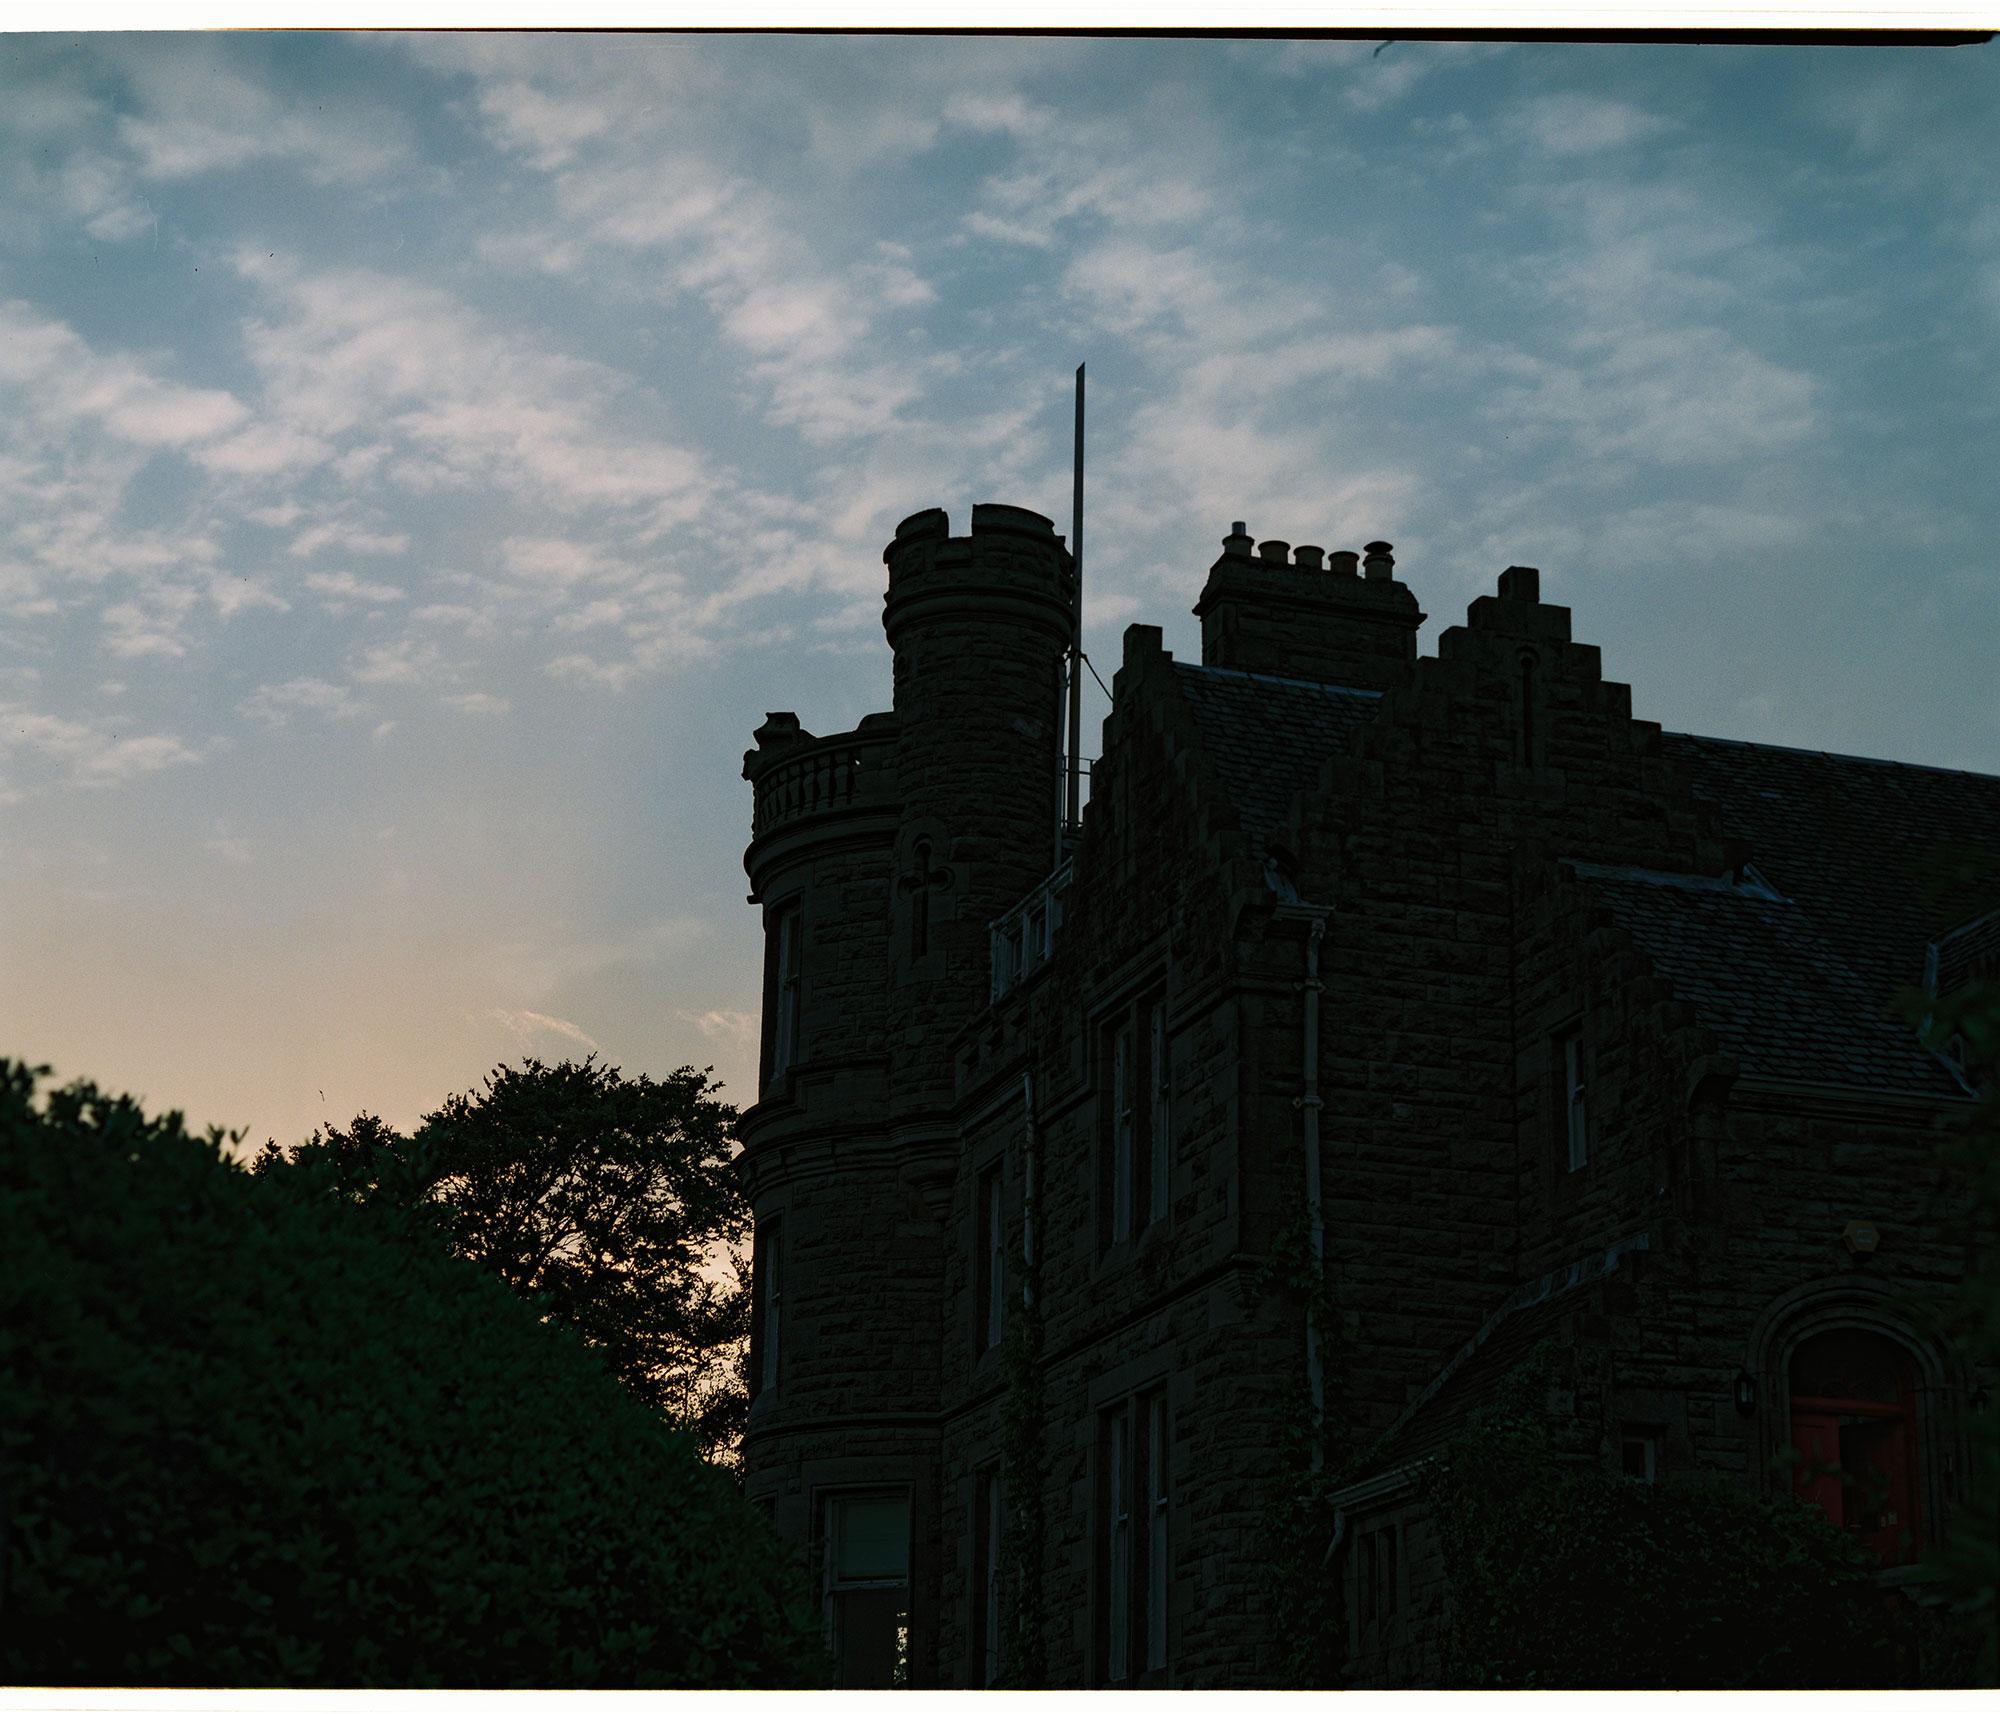 Analog Travel Diary from Scotland shot w/ Mamiya RB67 on Fuji Pro 400H